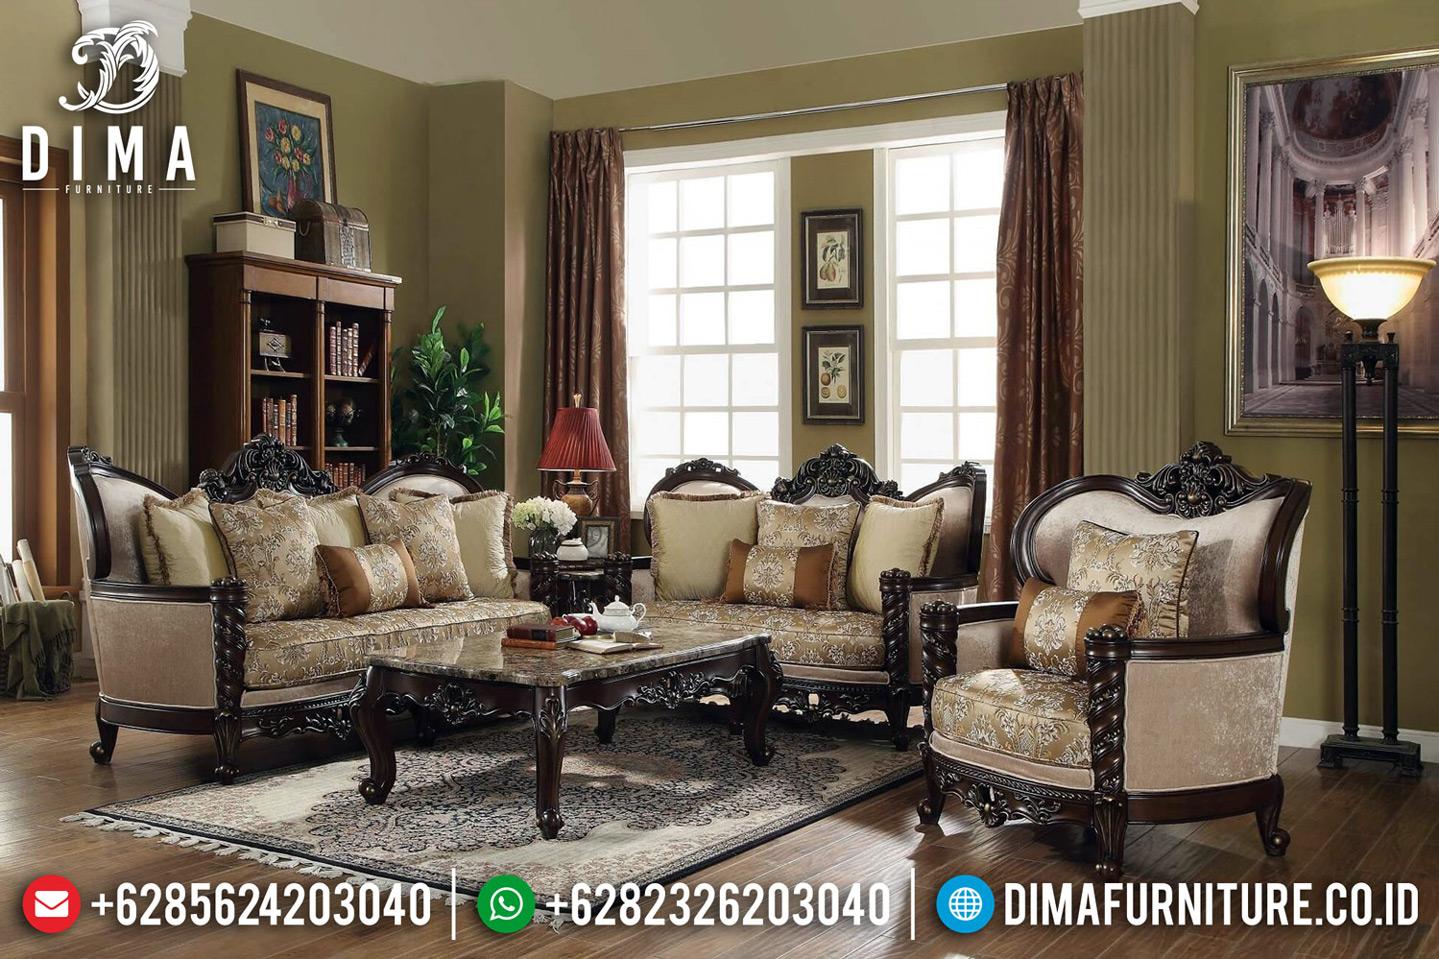 Davinci Style Kursi Sofa Tamu Mewah Luxury Carving Carlotta Furniture Indoesia TTJ-0642